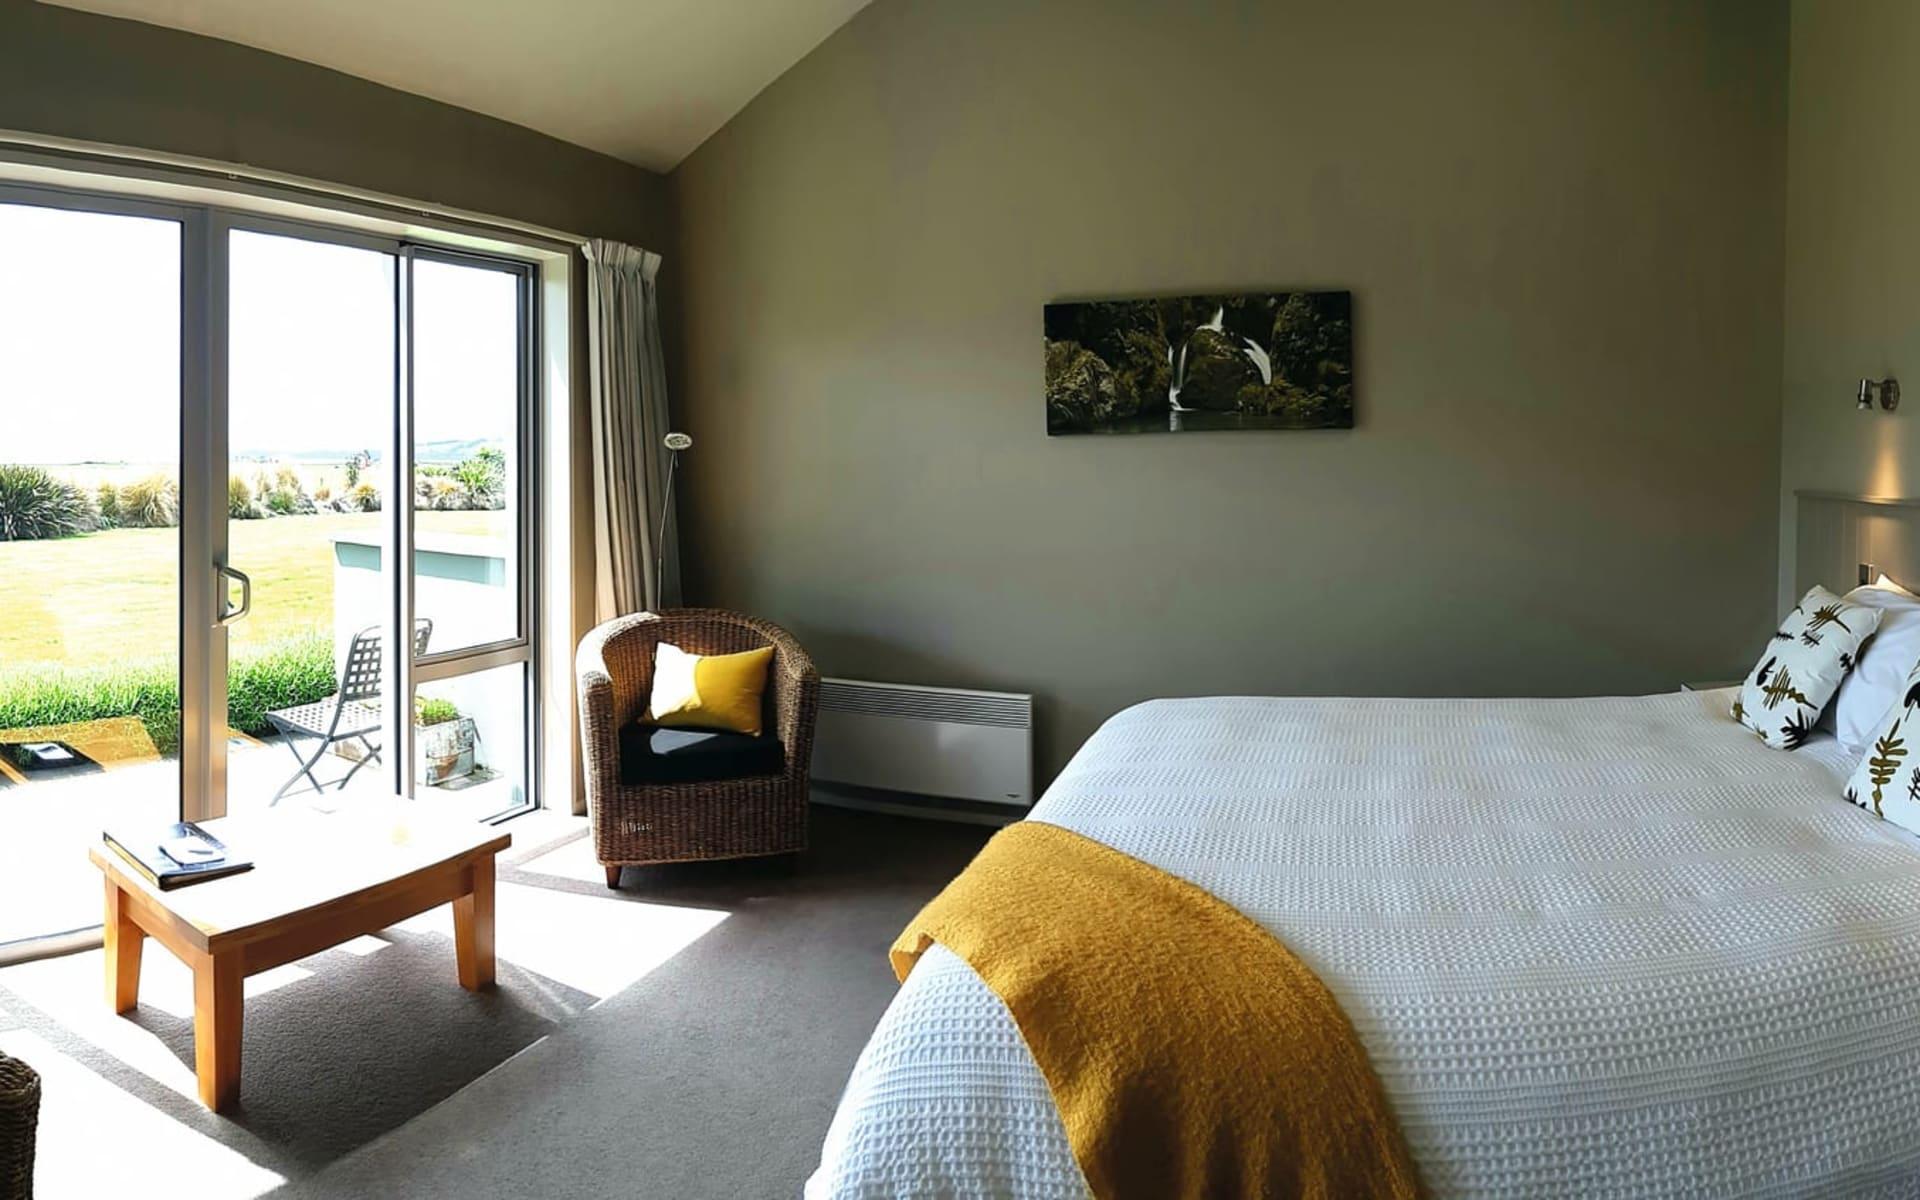 Dunluce Bed & Breakfast in Te Anau: Zimmer Dunluce Te Anau - Zimmer cDunluce